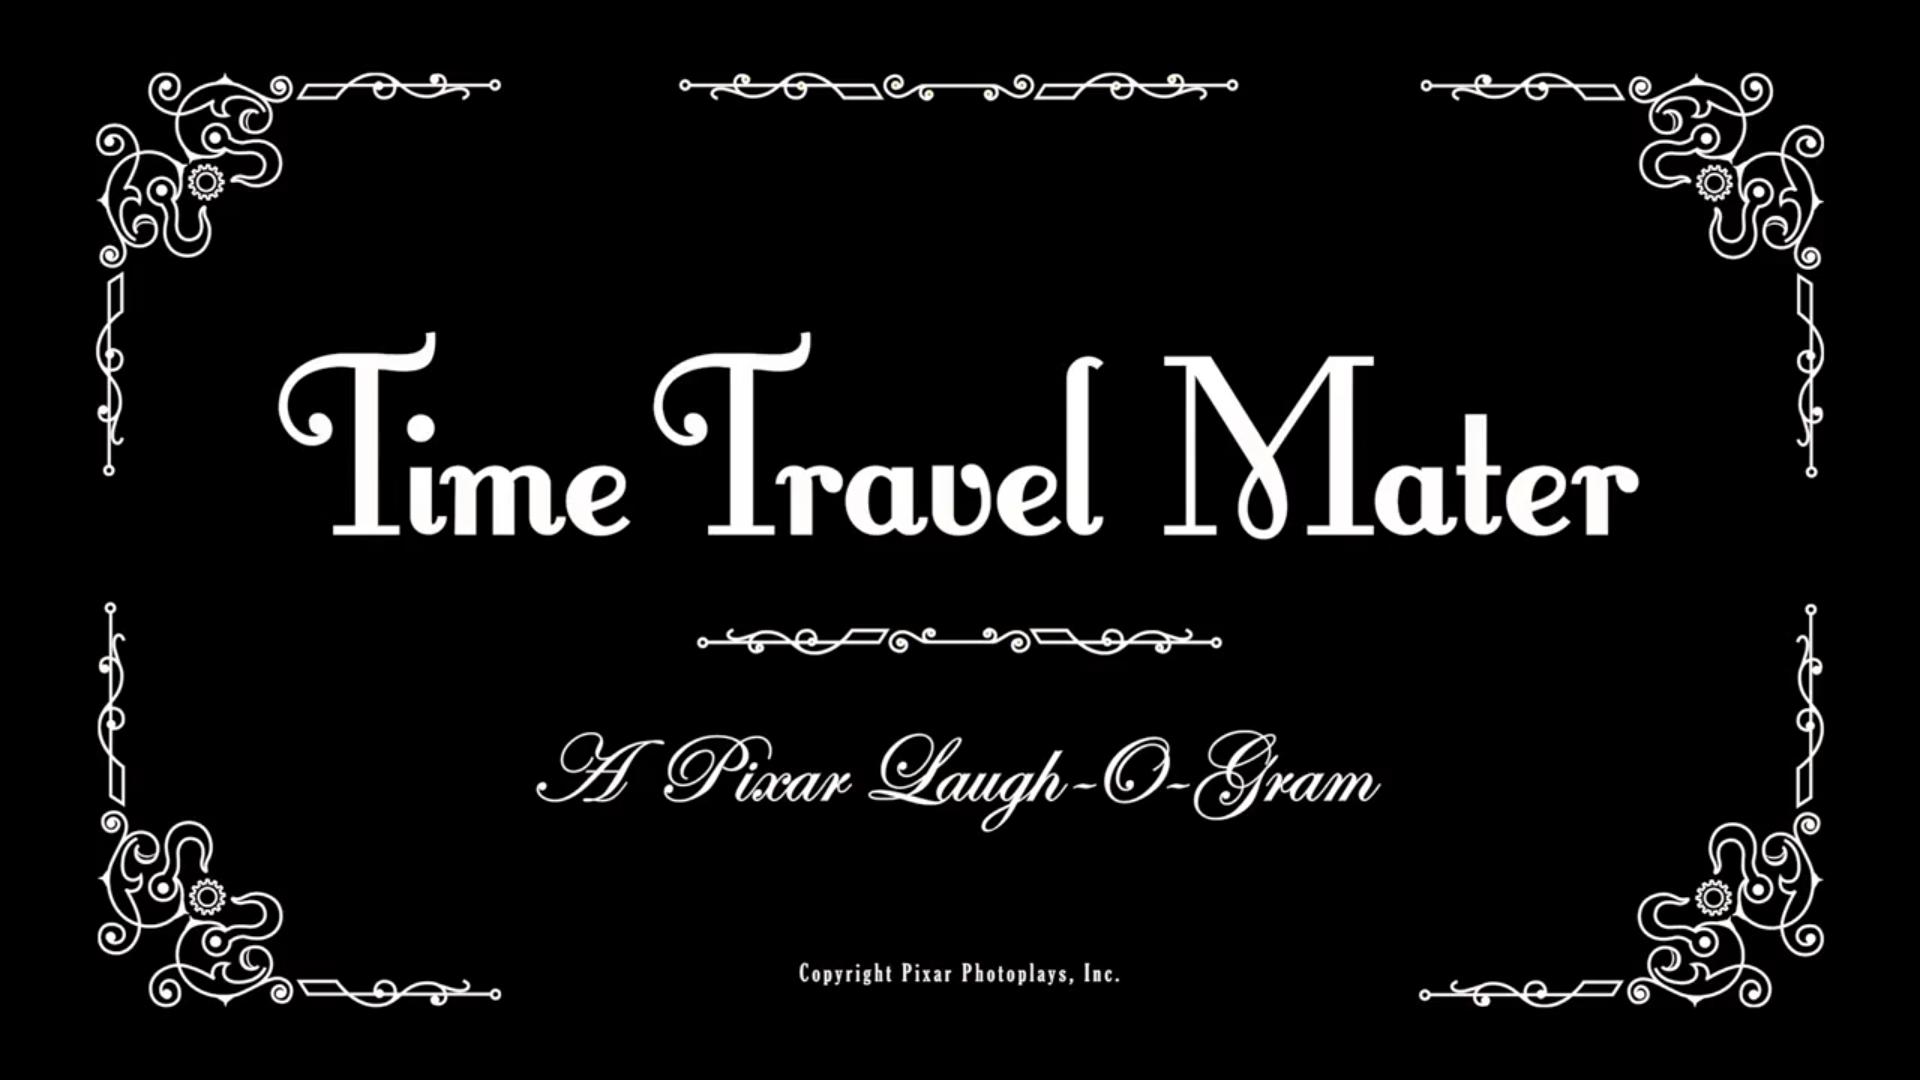 Time Travel Mater Pixar Wiki Fandom Powered By Wikia